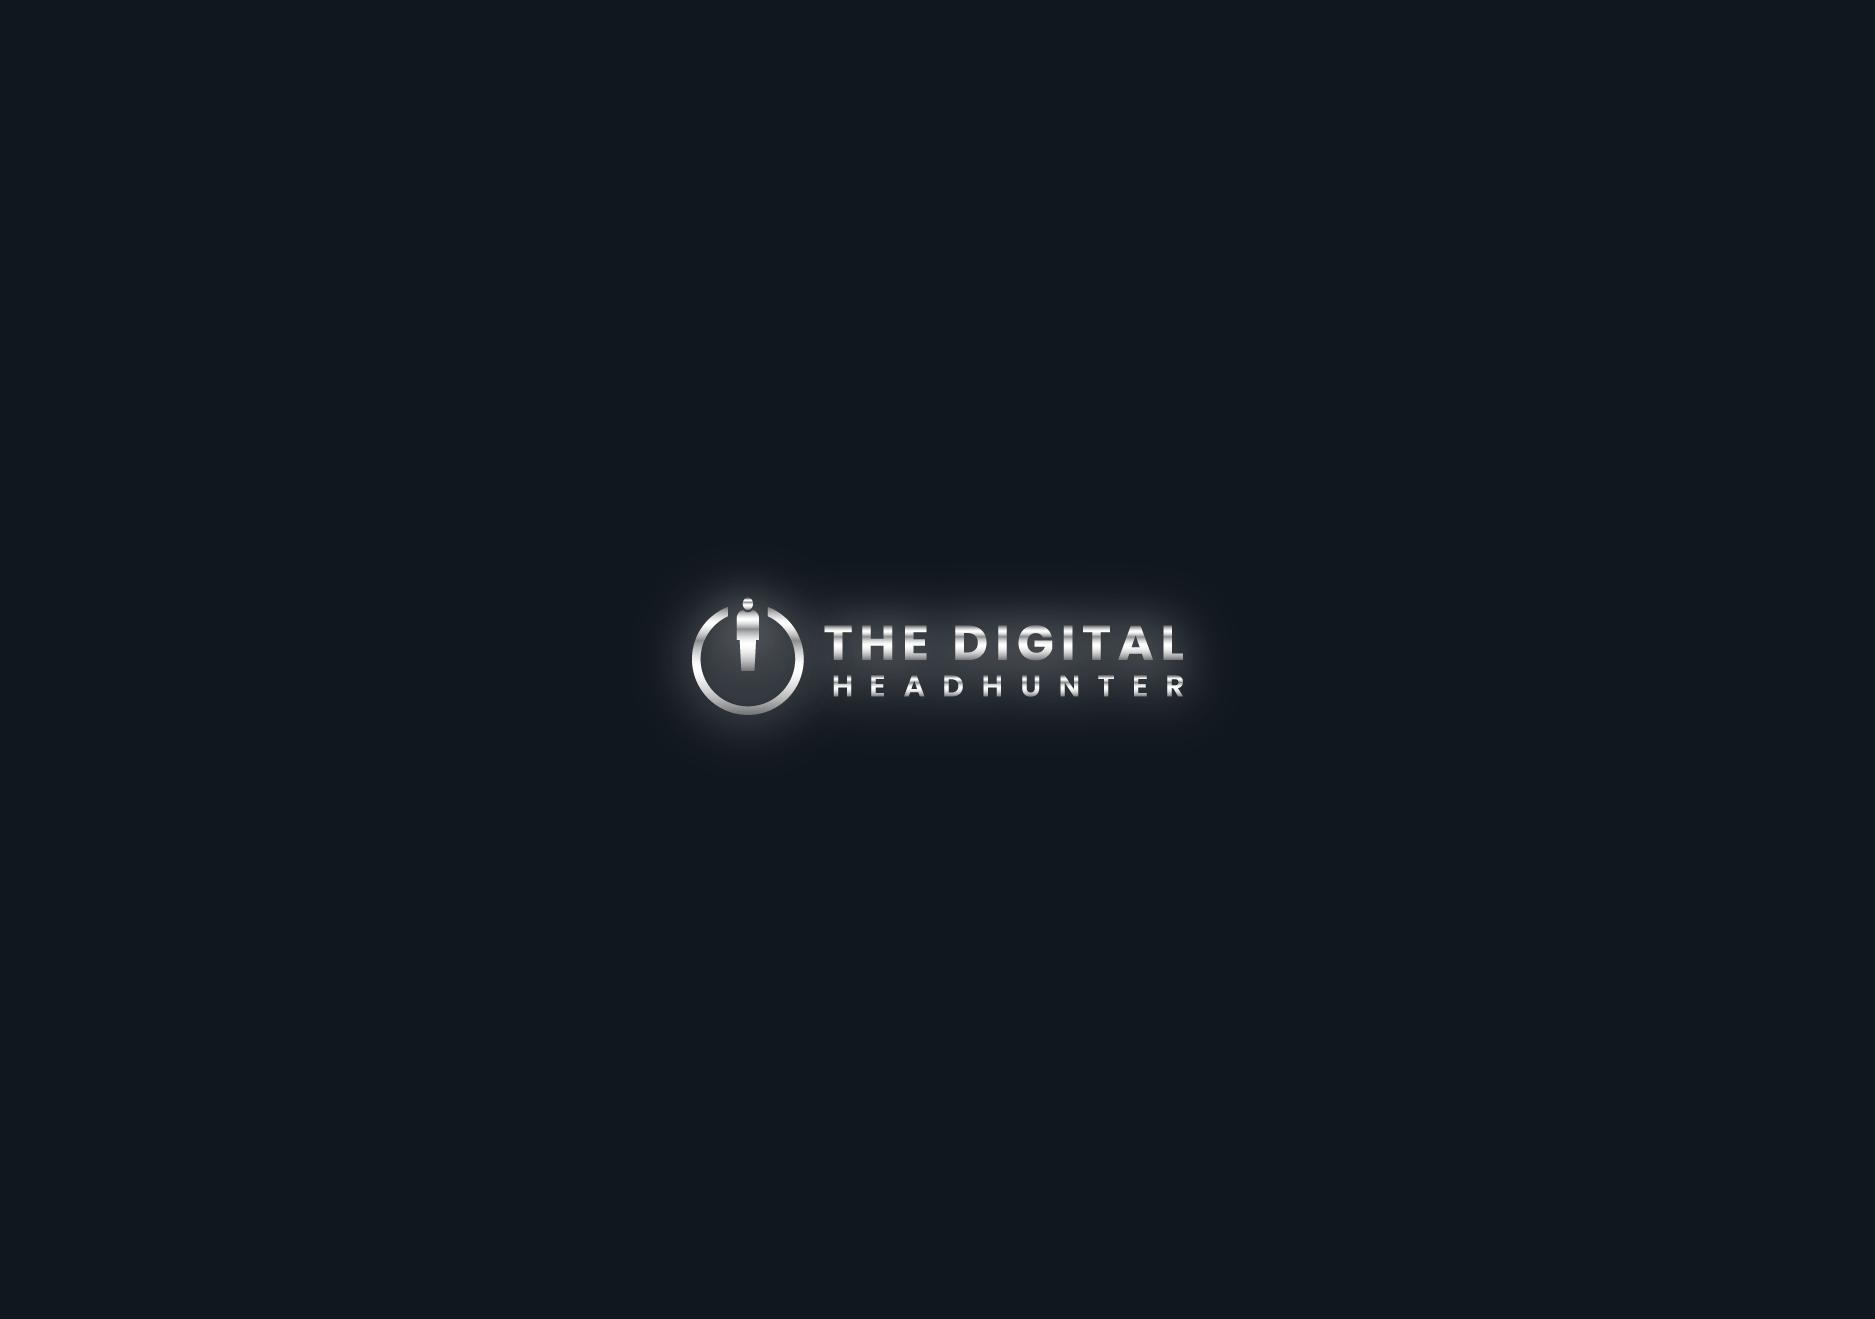 Design a logo for The Digital Headhunter